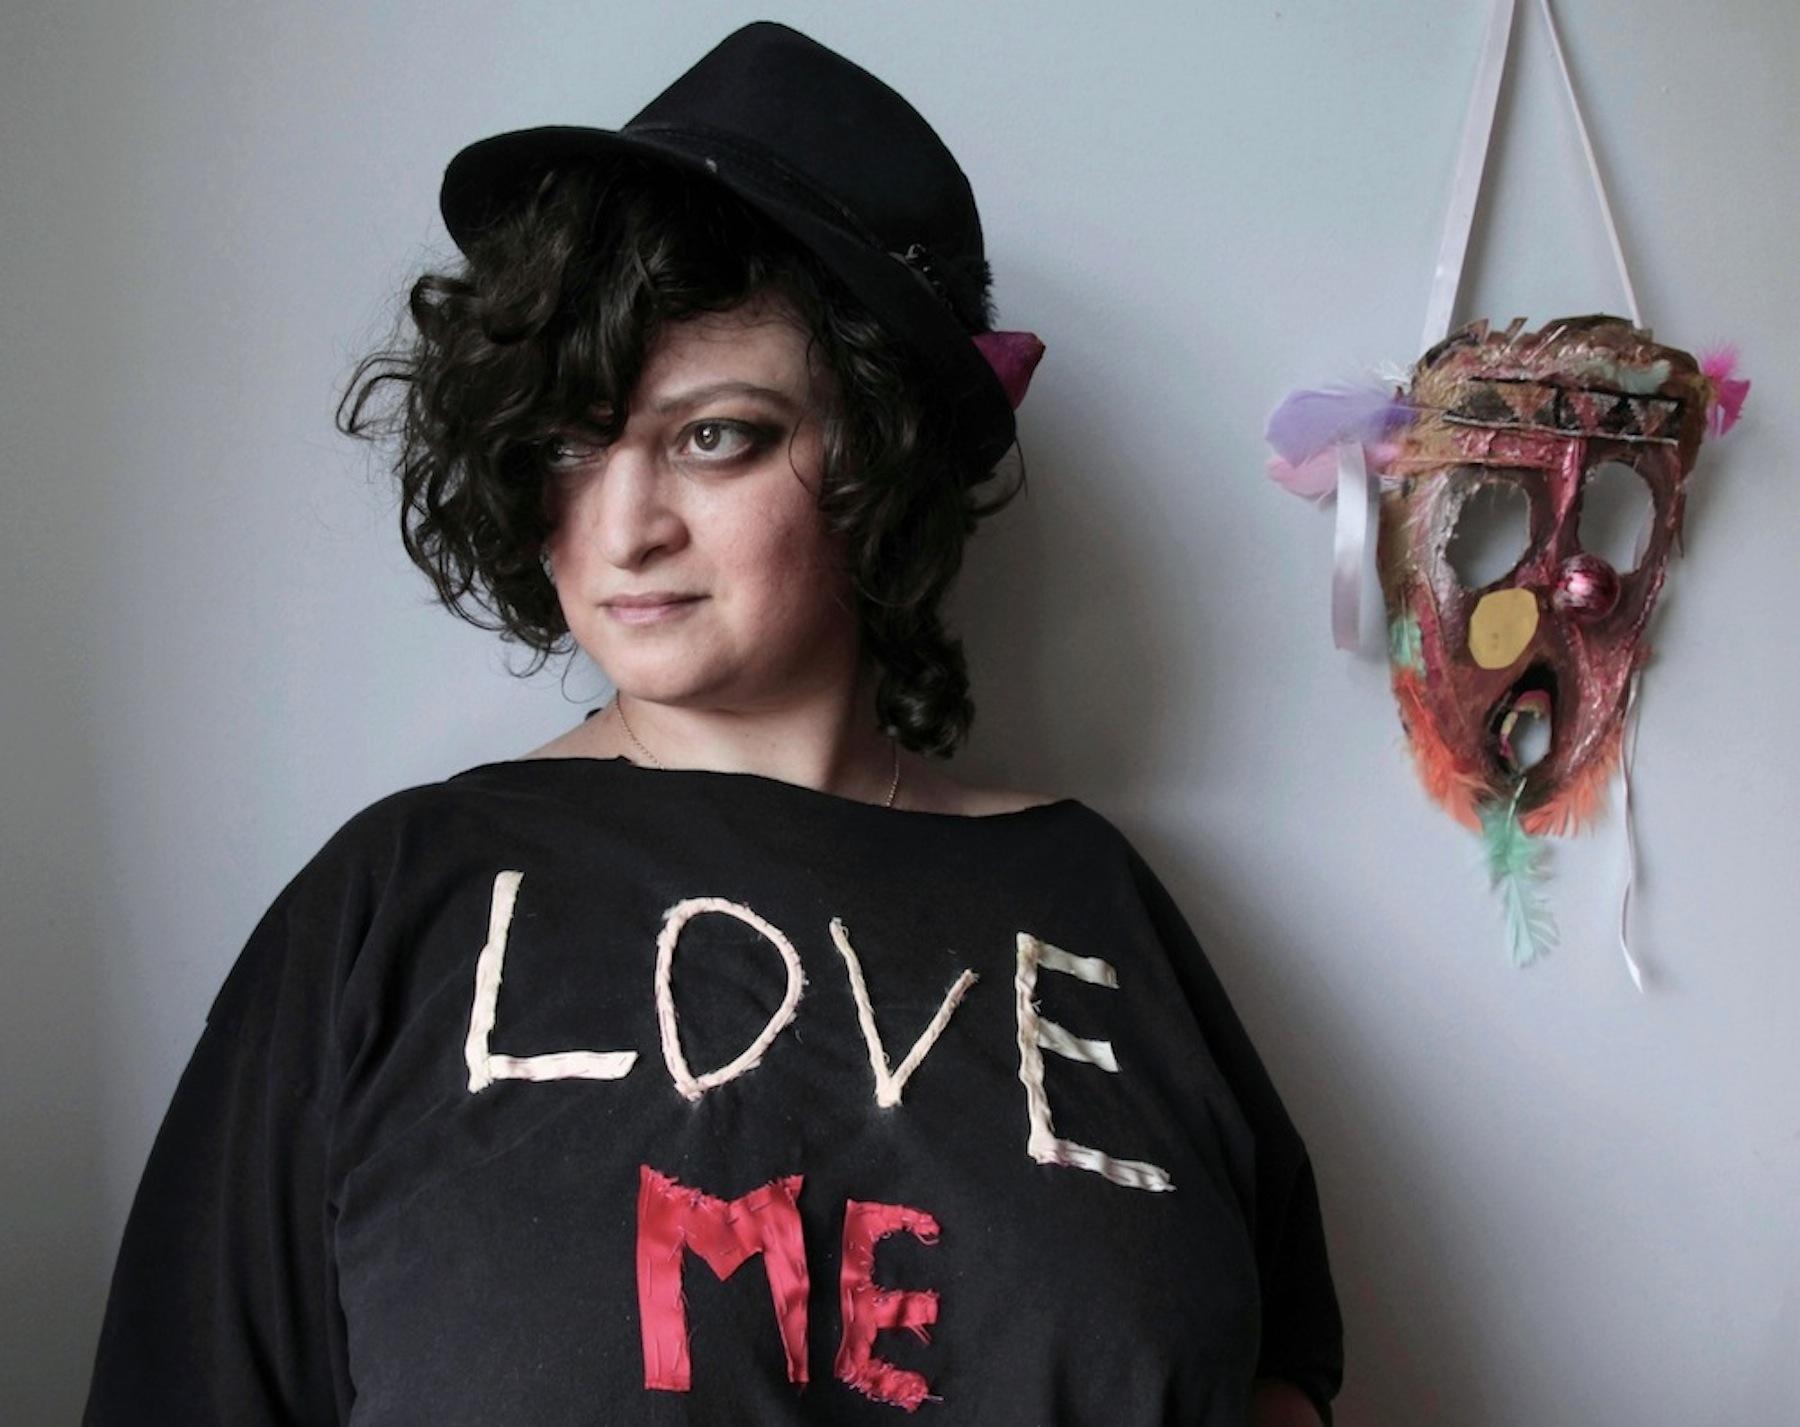 Katya Grokhovsky, Selfie as an artist with a mask, 2013